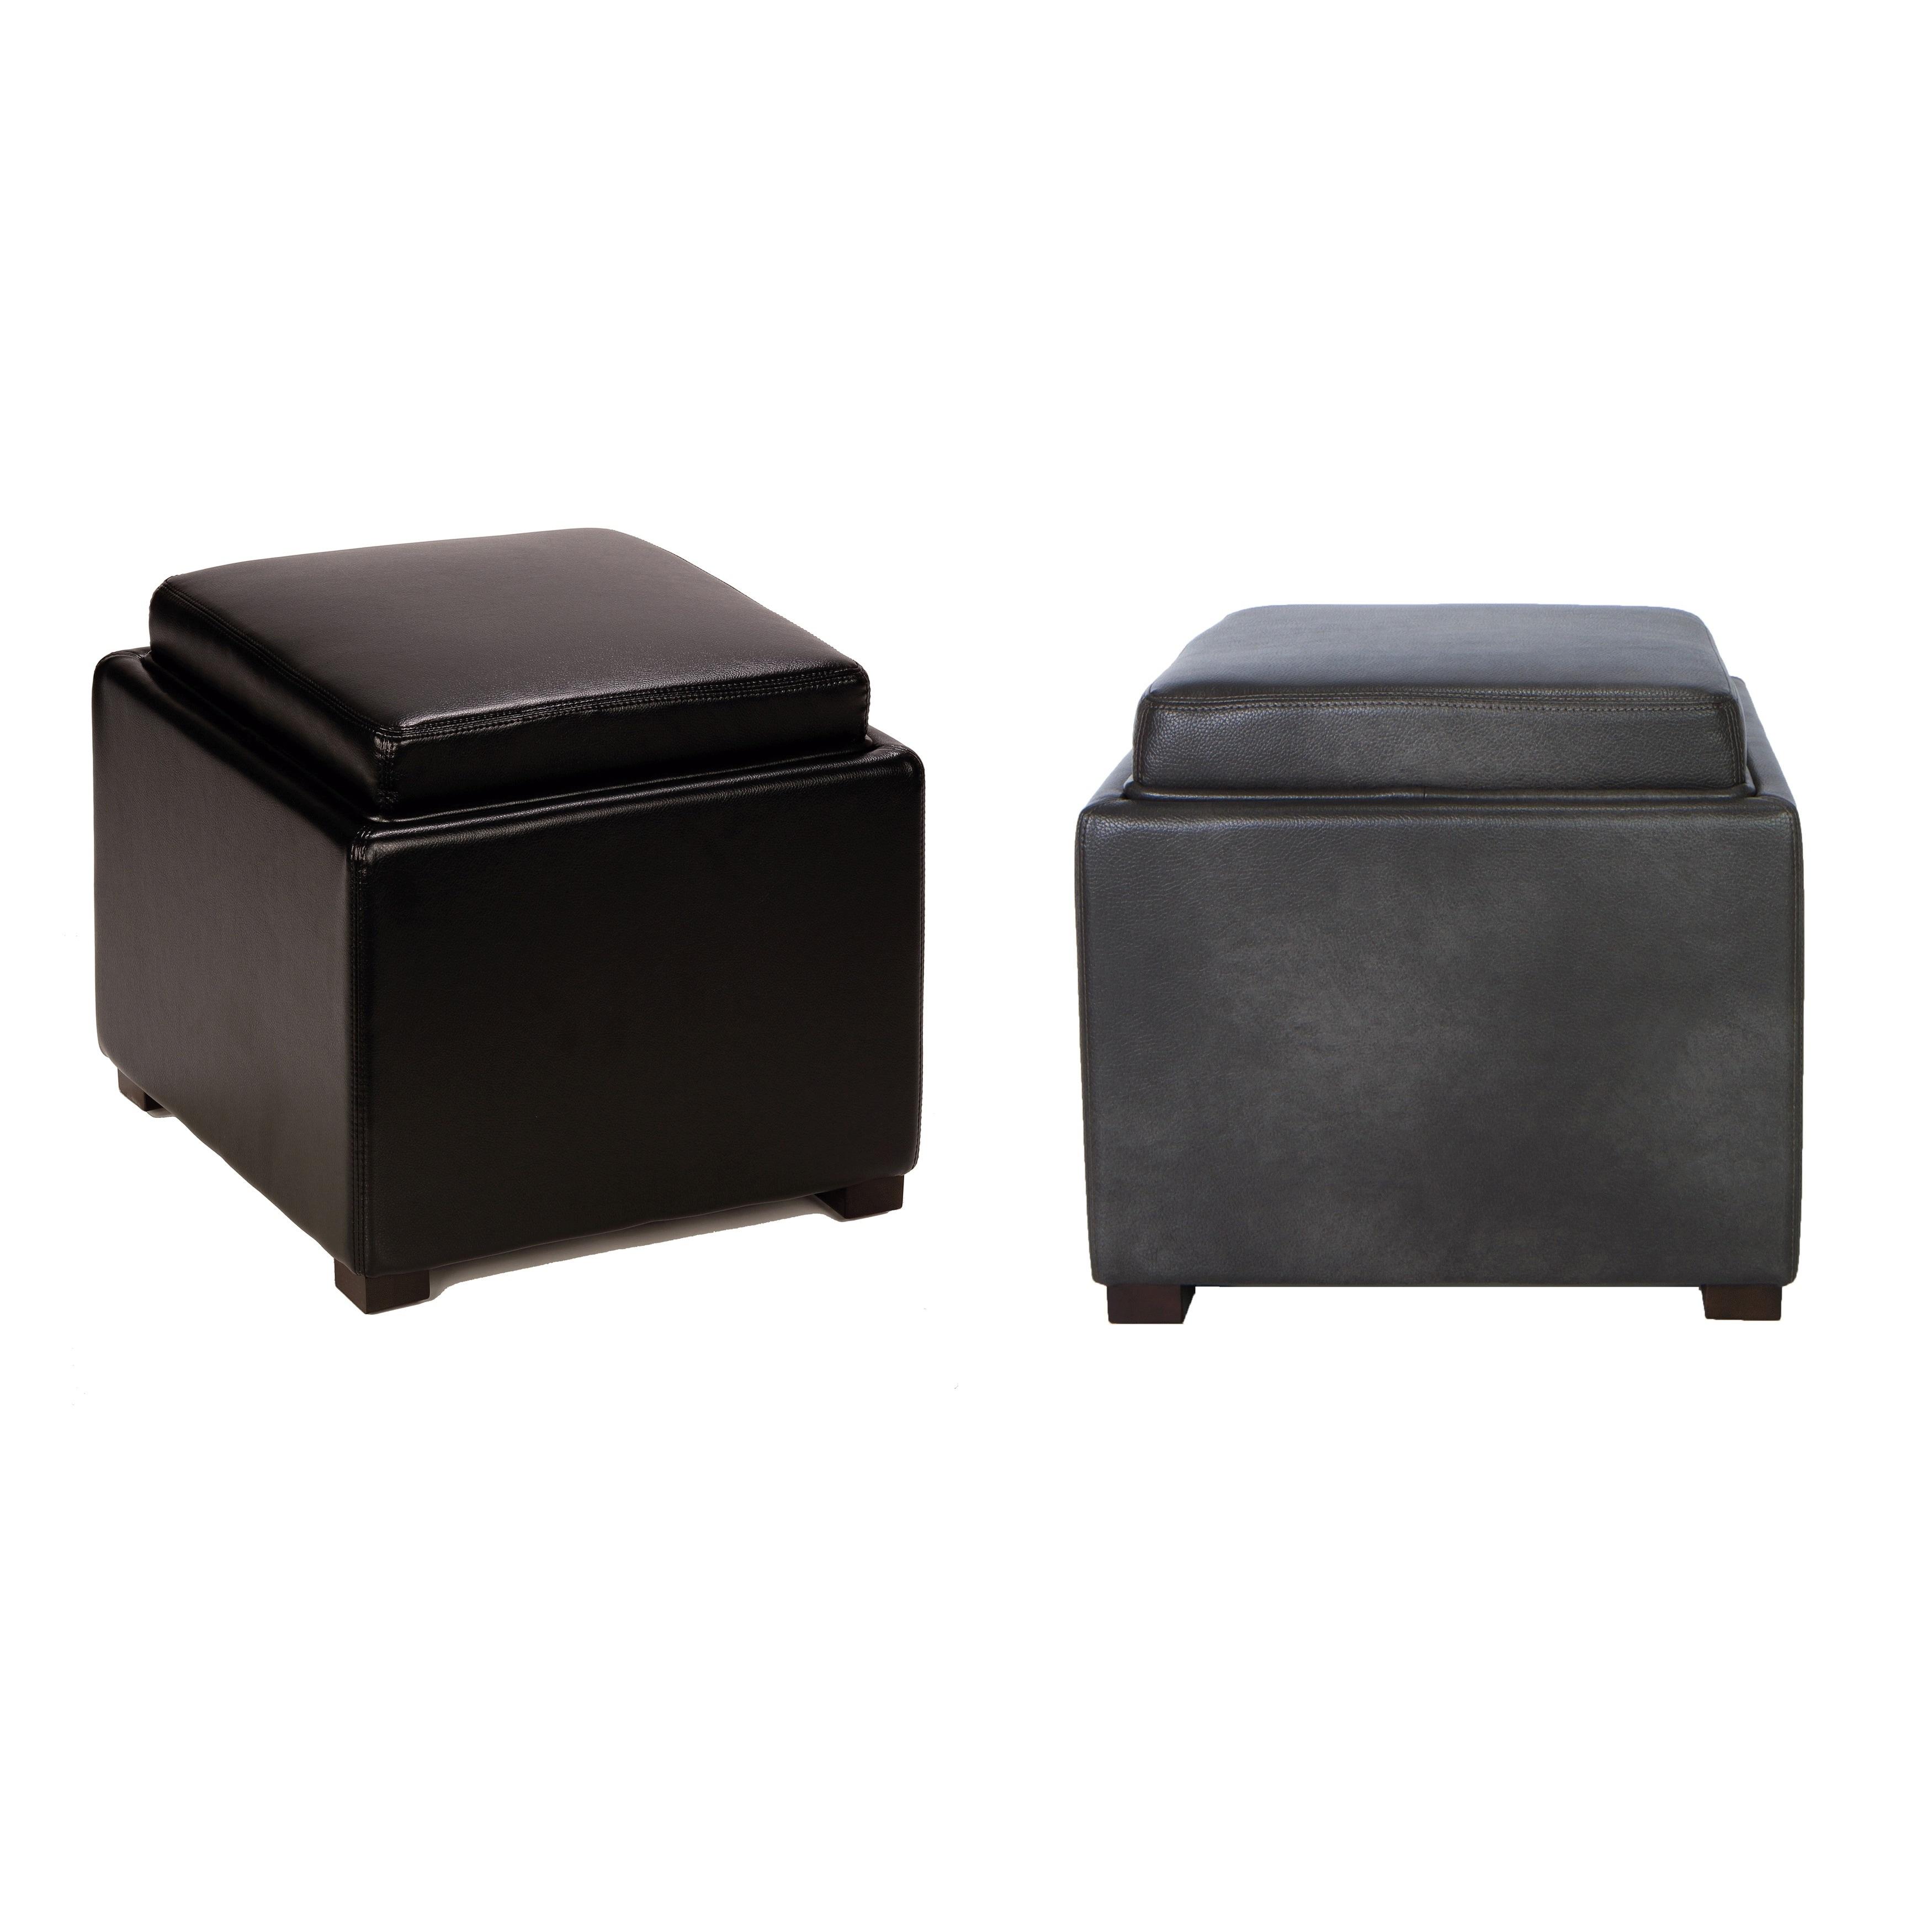 Cortesi Home Bonded Leather Mavi Black Storage Tray Ottom...